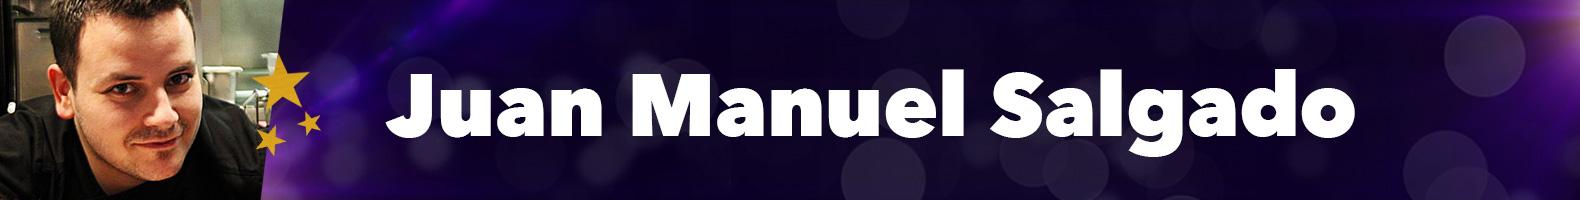 Juan-Manuel-Salgado